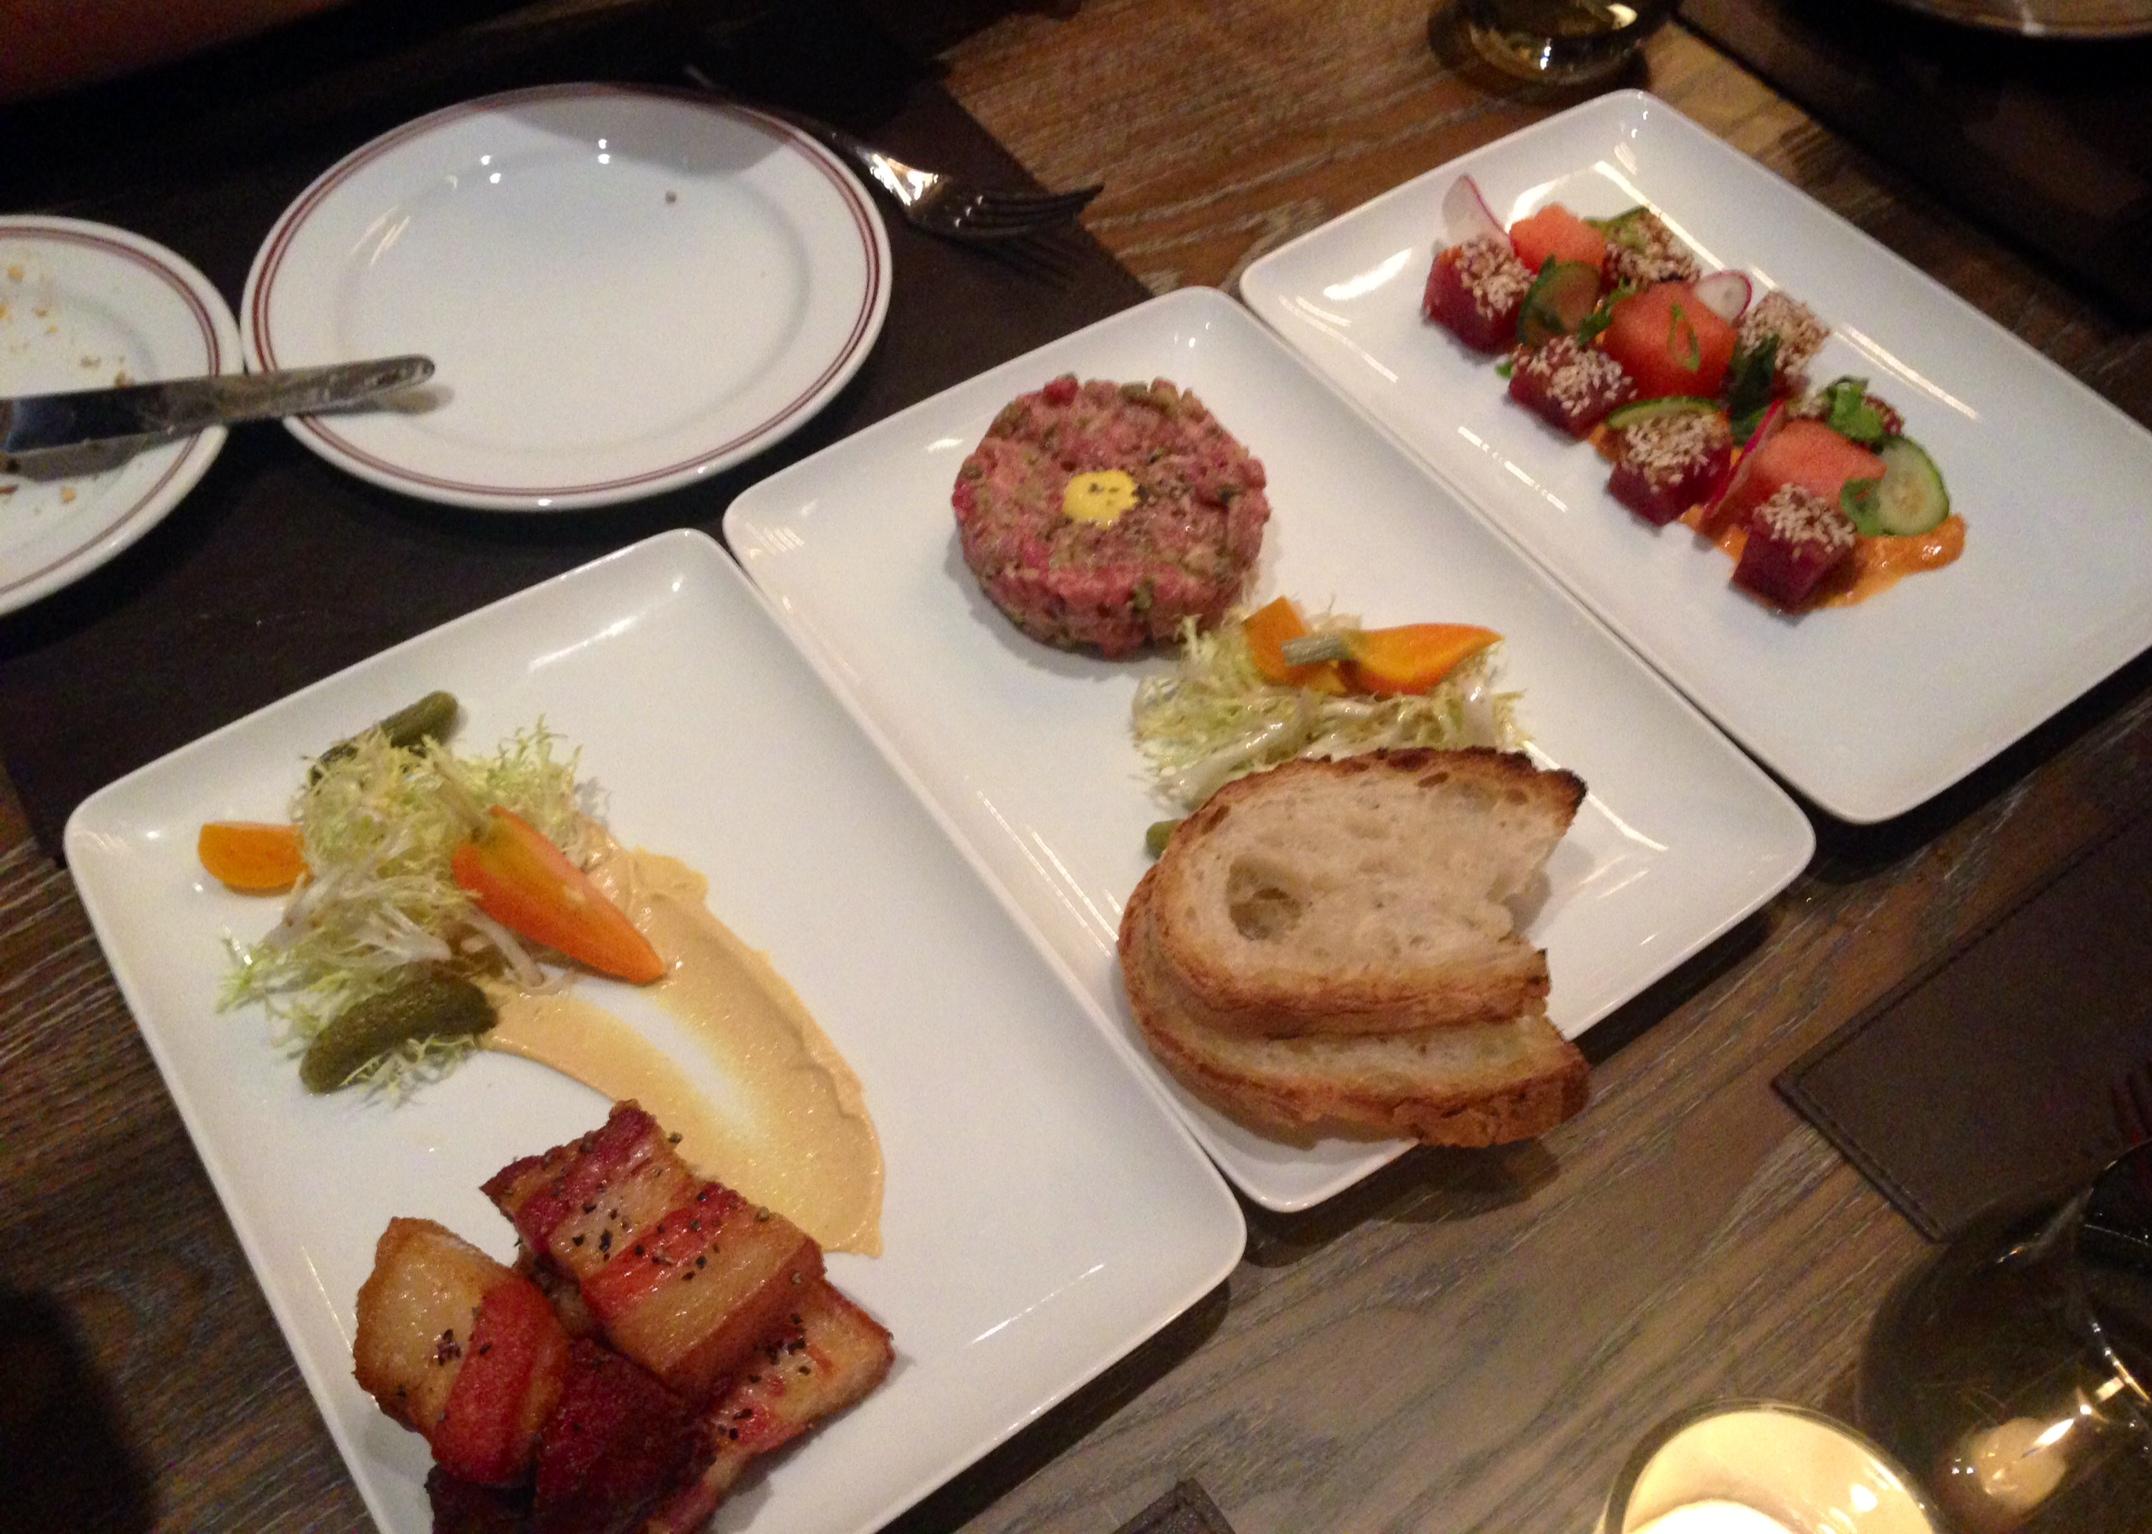 (L-R) Rillons croustillants, steak tartare, tuna crudo